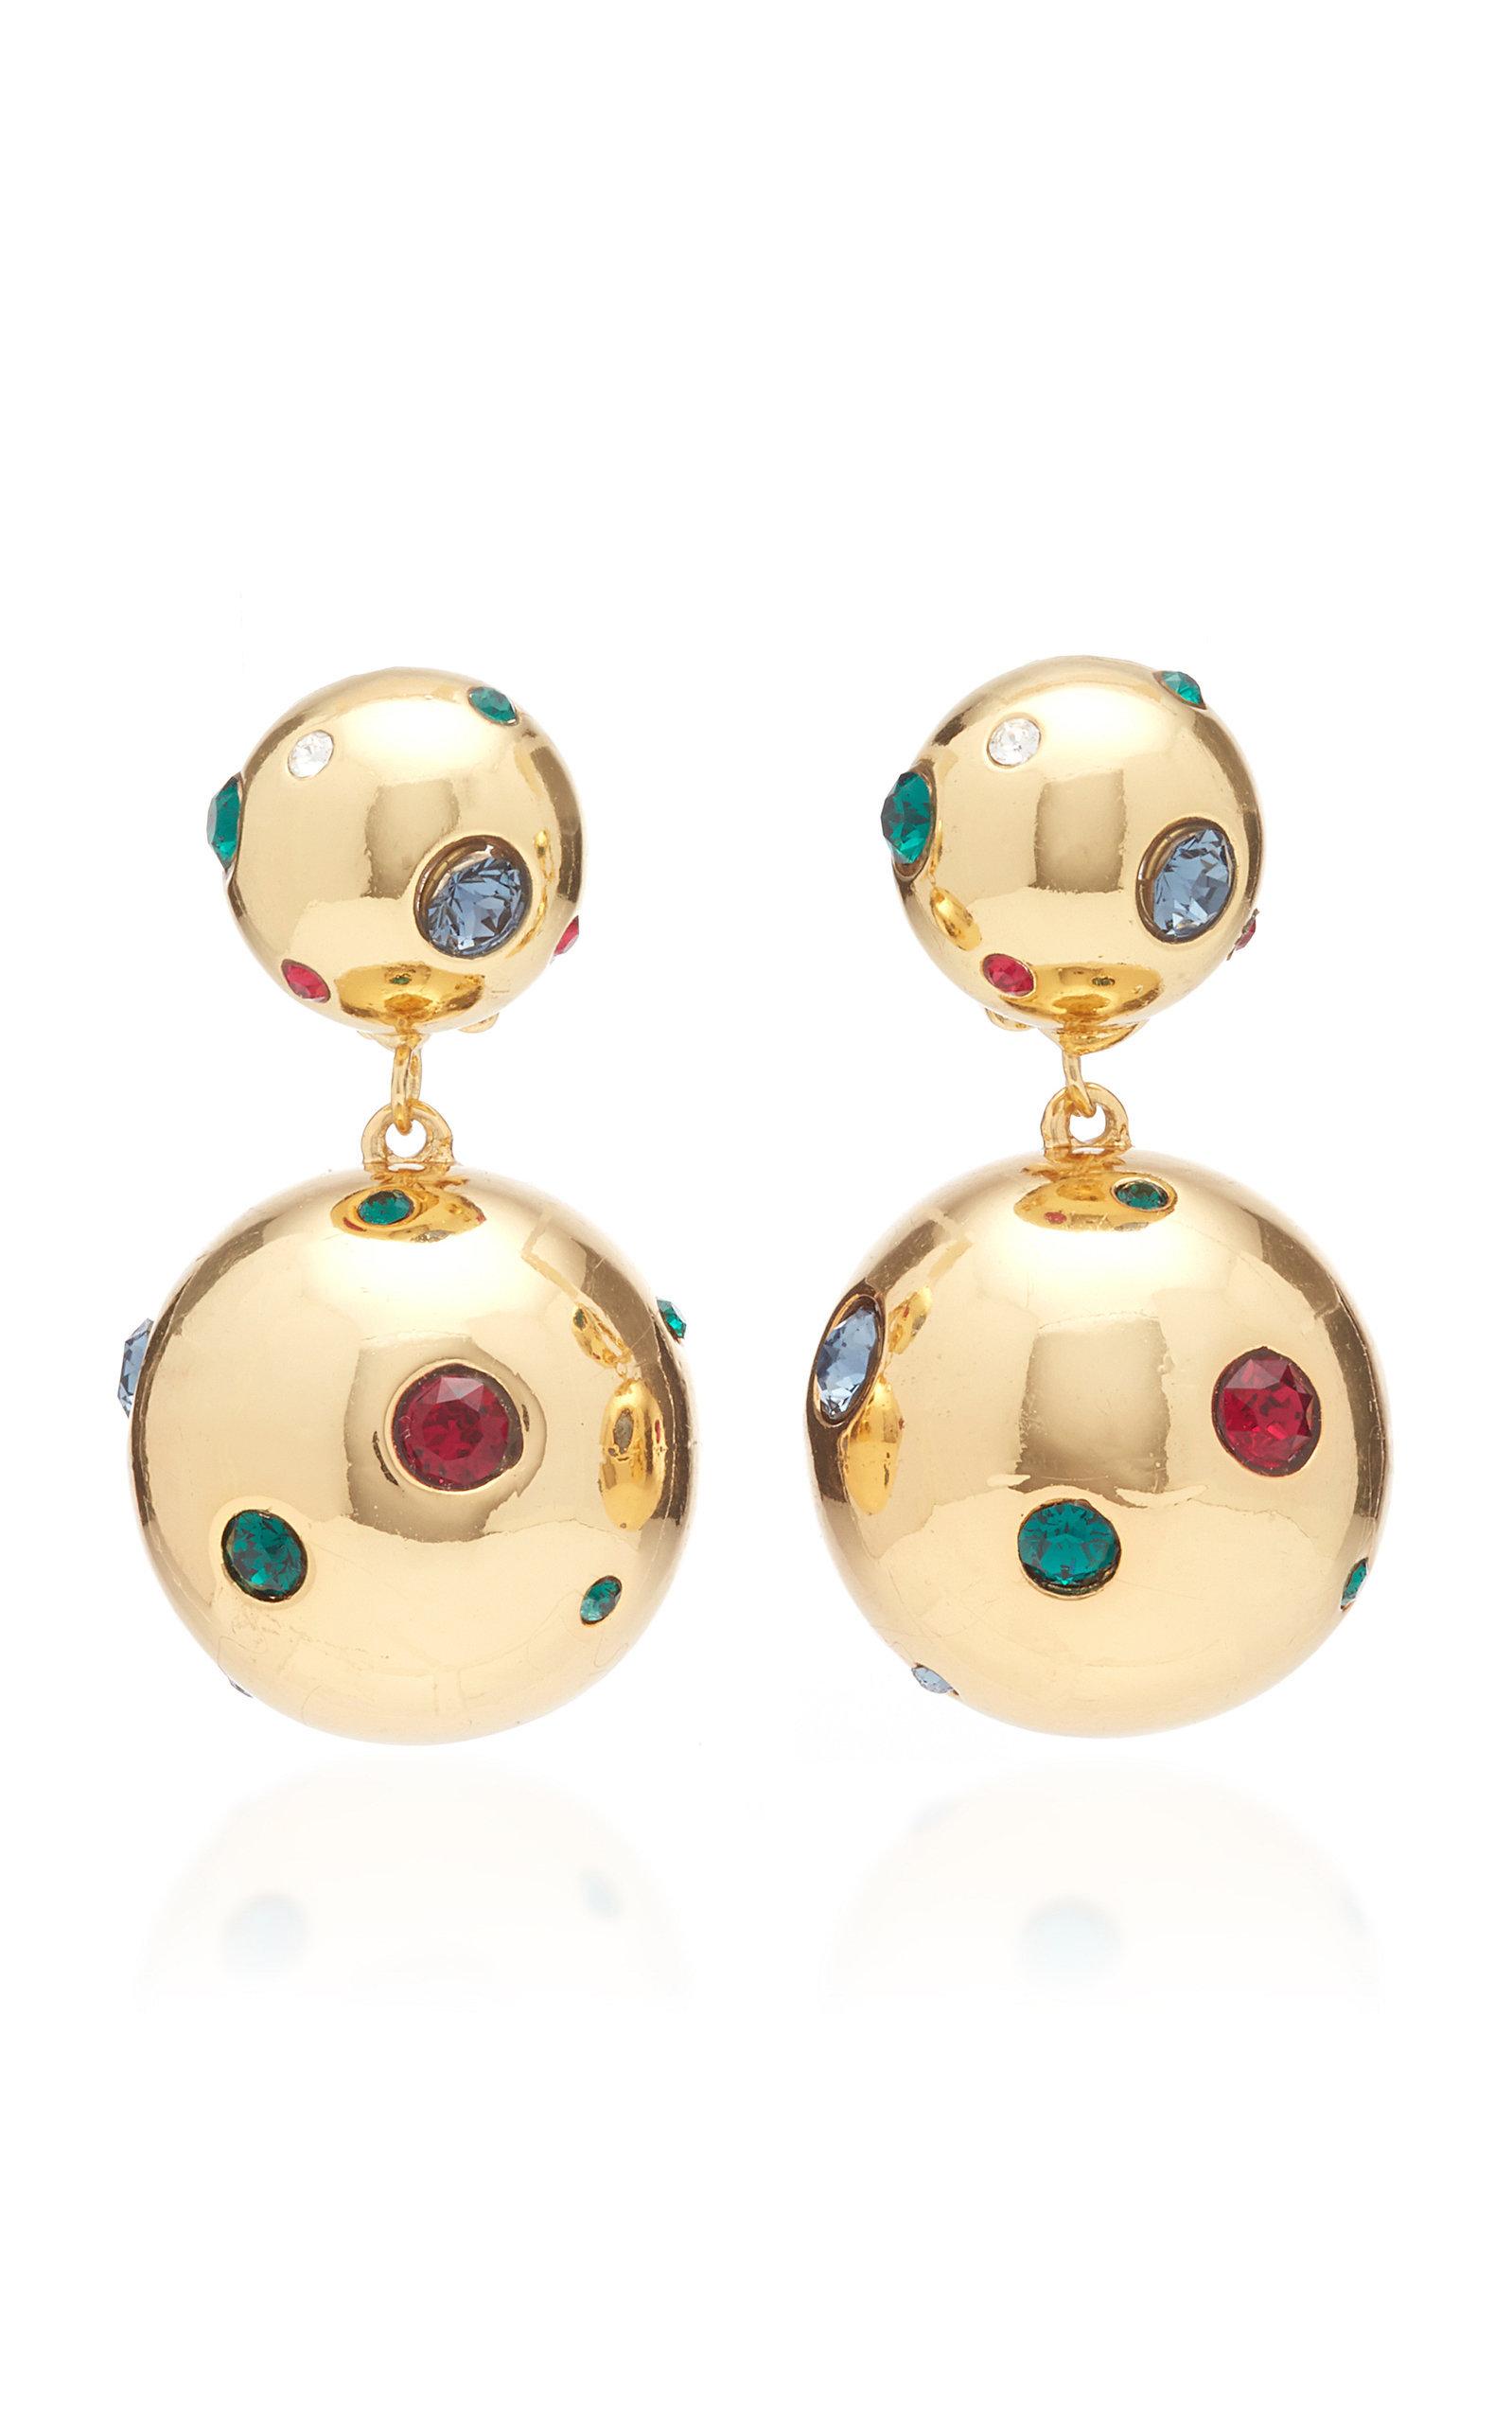 large_rebecca-de-ravenel-multi-i-see-stars-earrings-gold-plated-crystal-clip-earrings.jpg